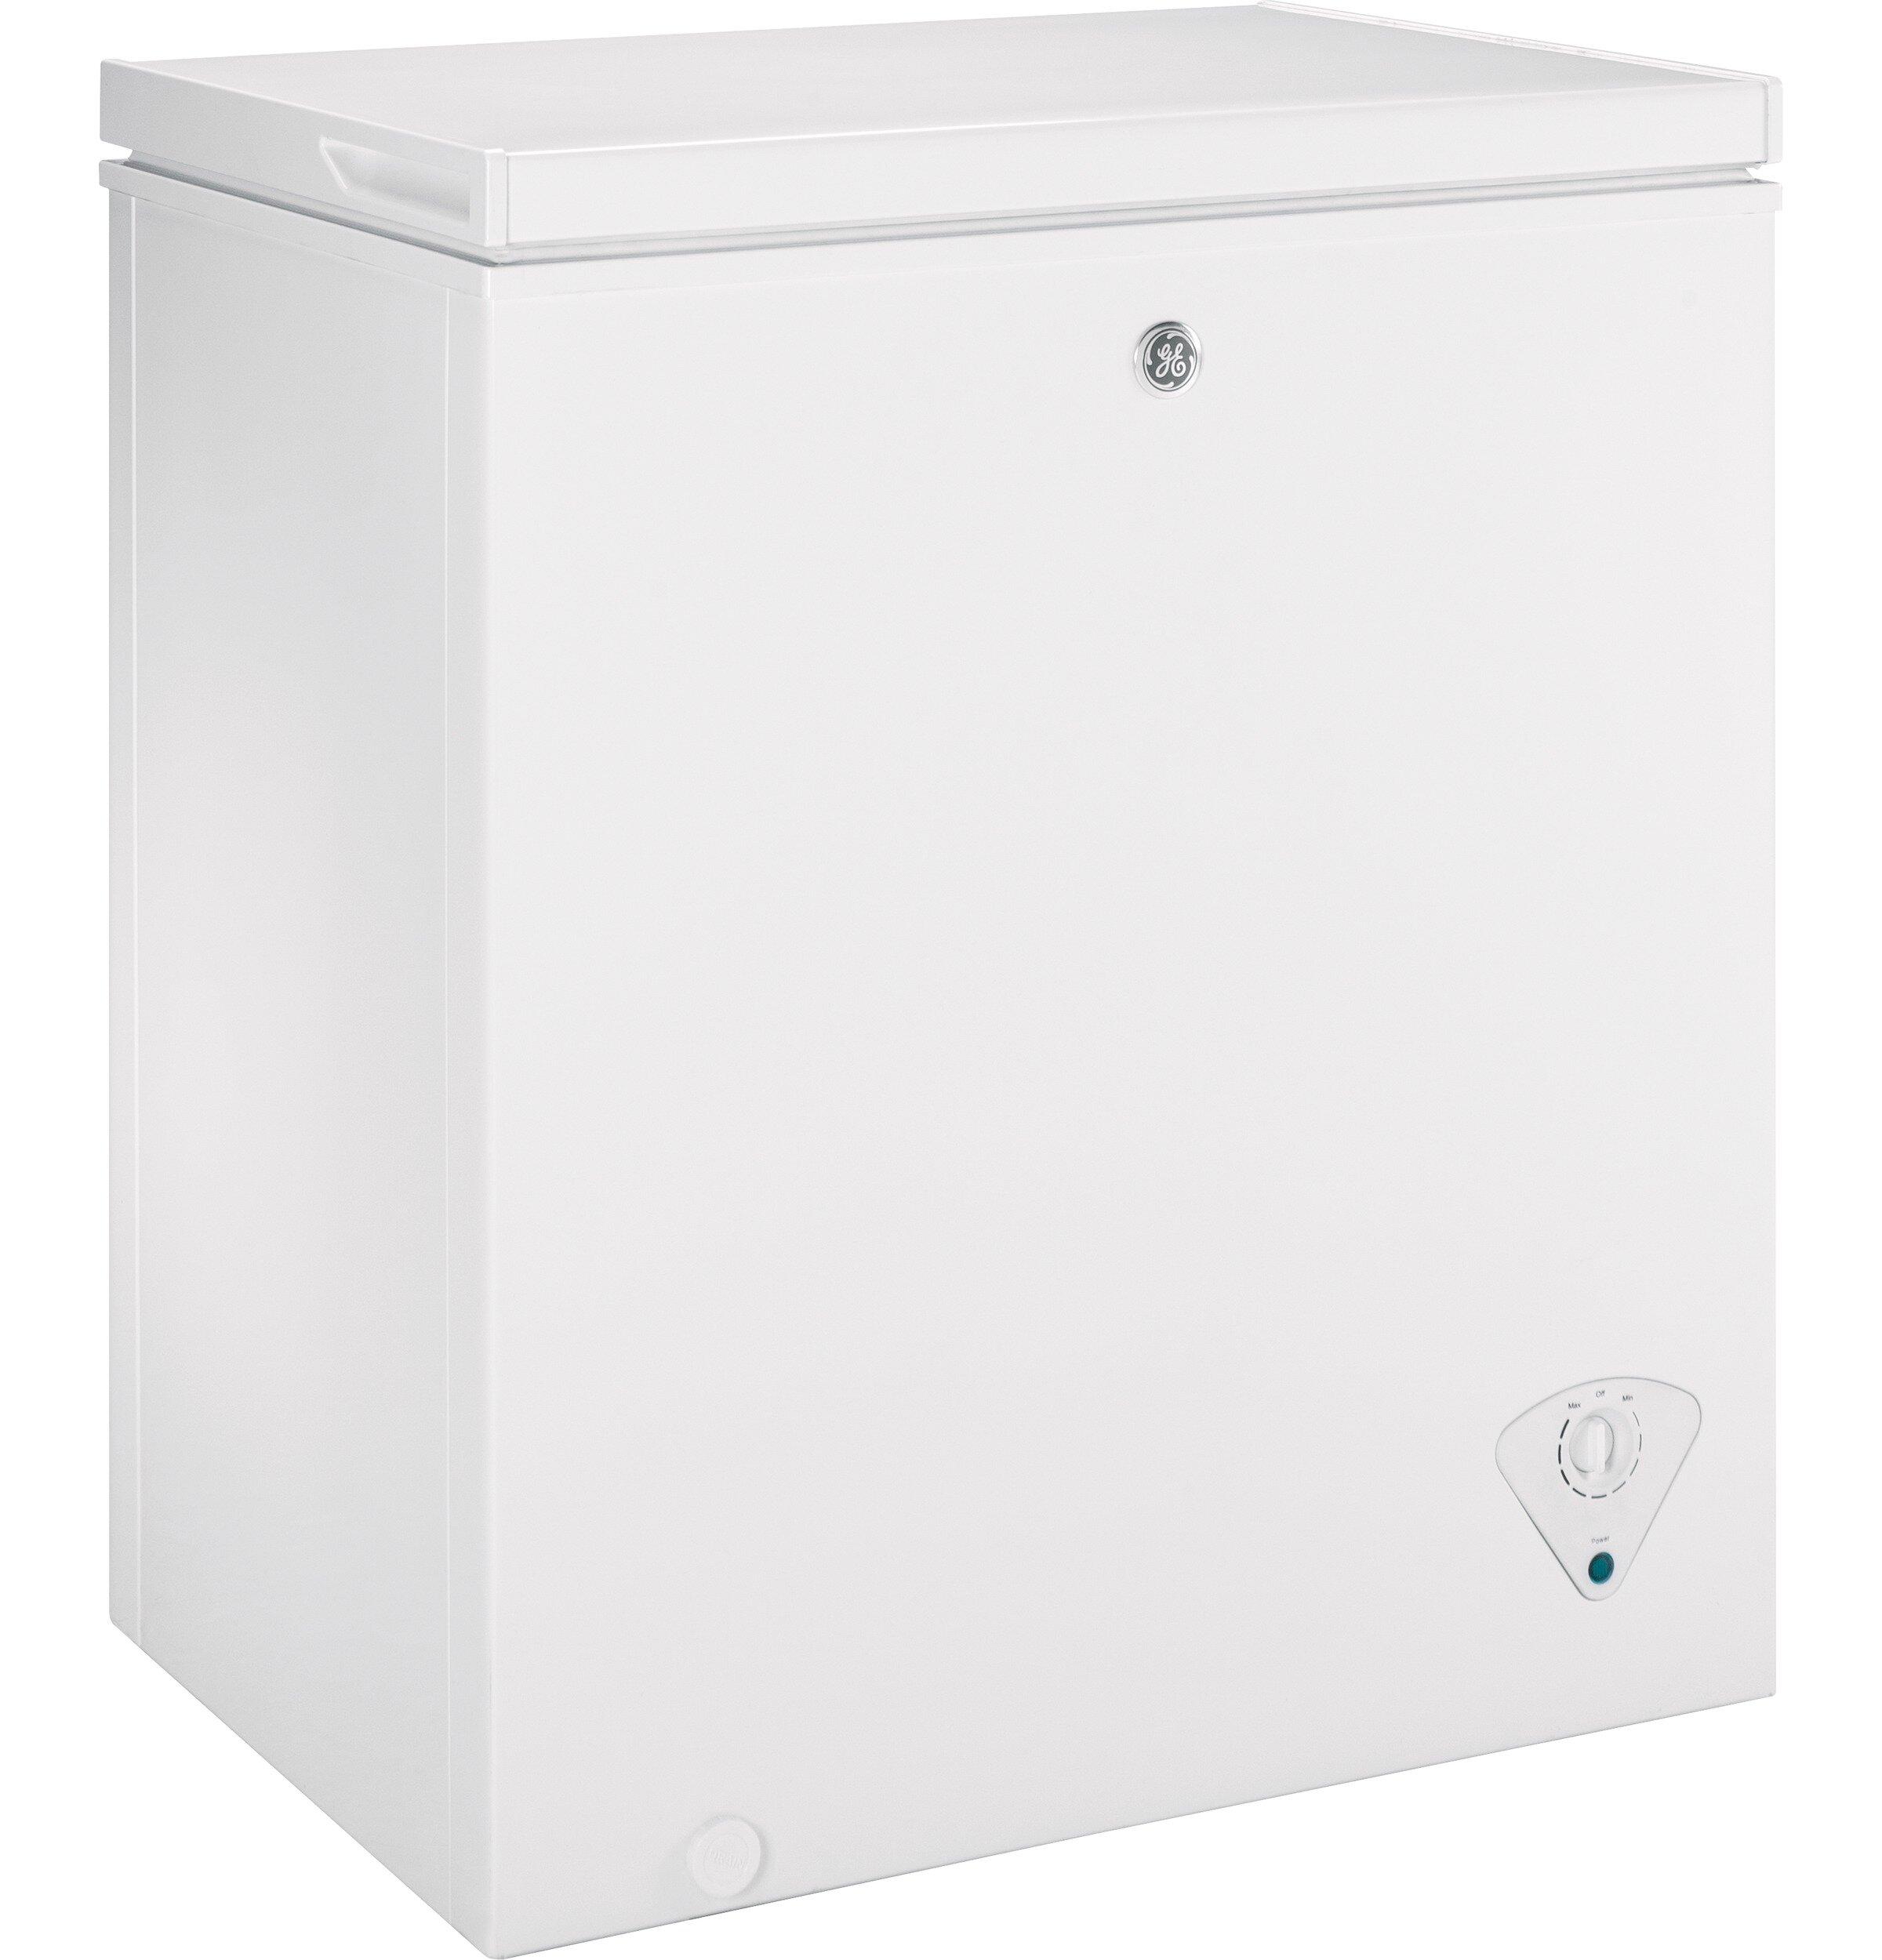 Ge Appliances Garage Ready 5 Cu Ft Chest Freezer Reviews Wayfair